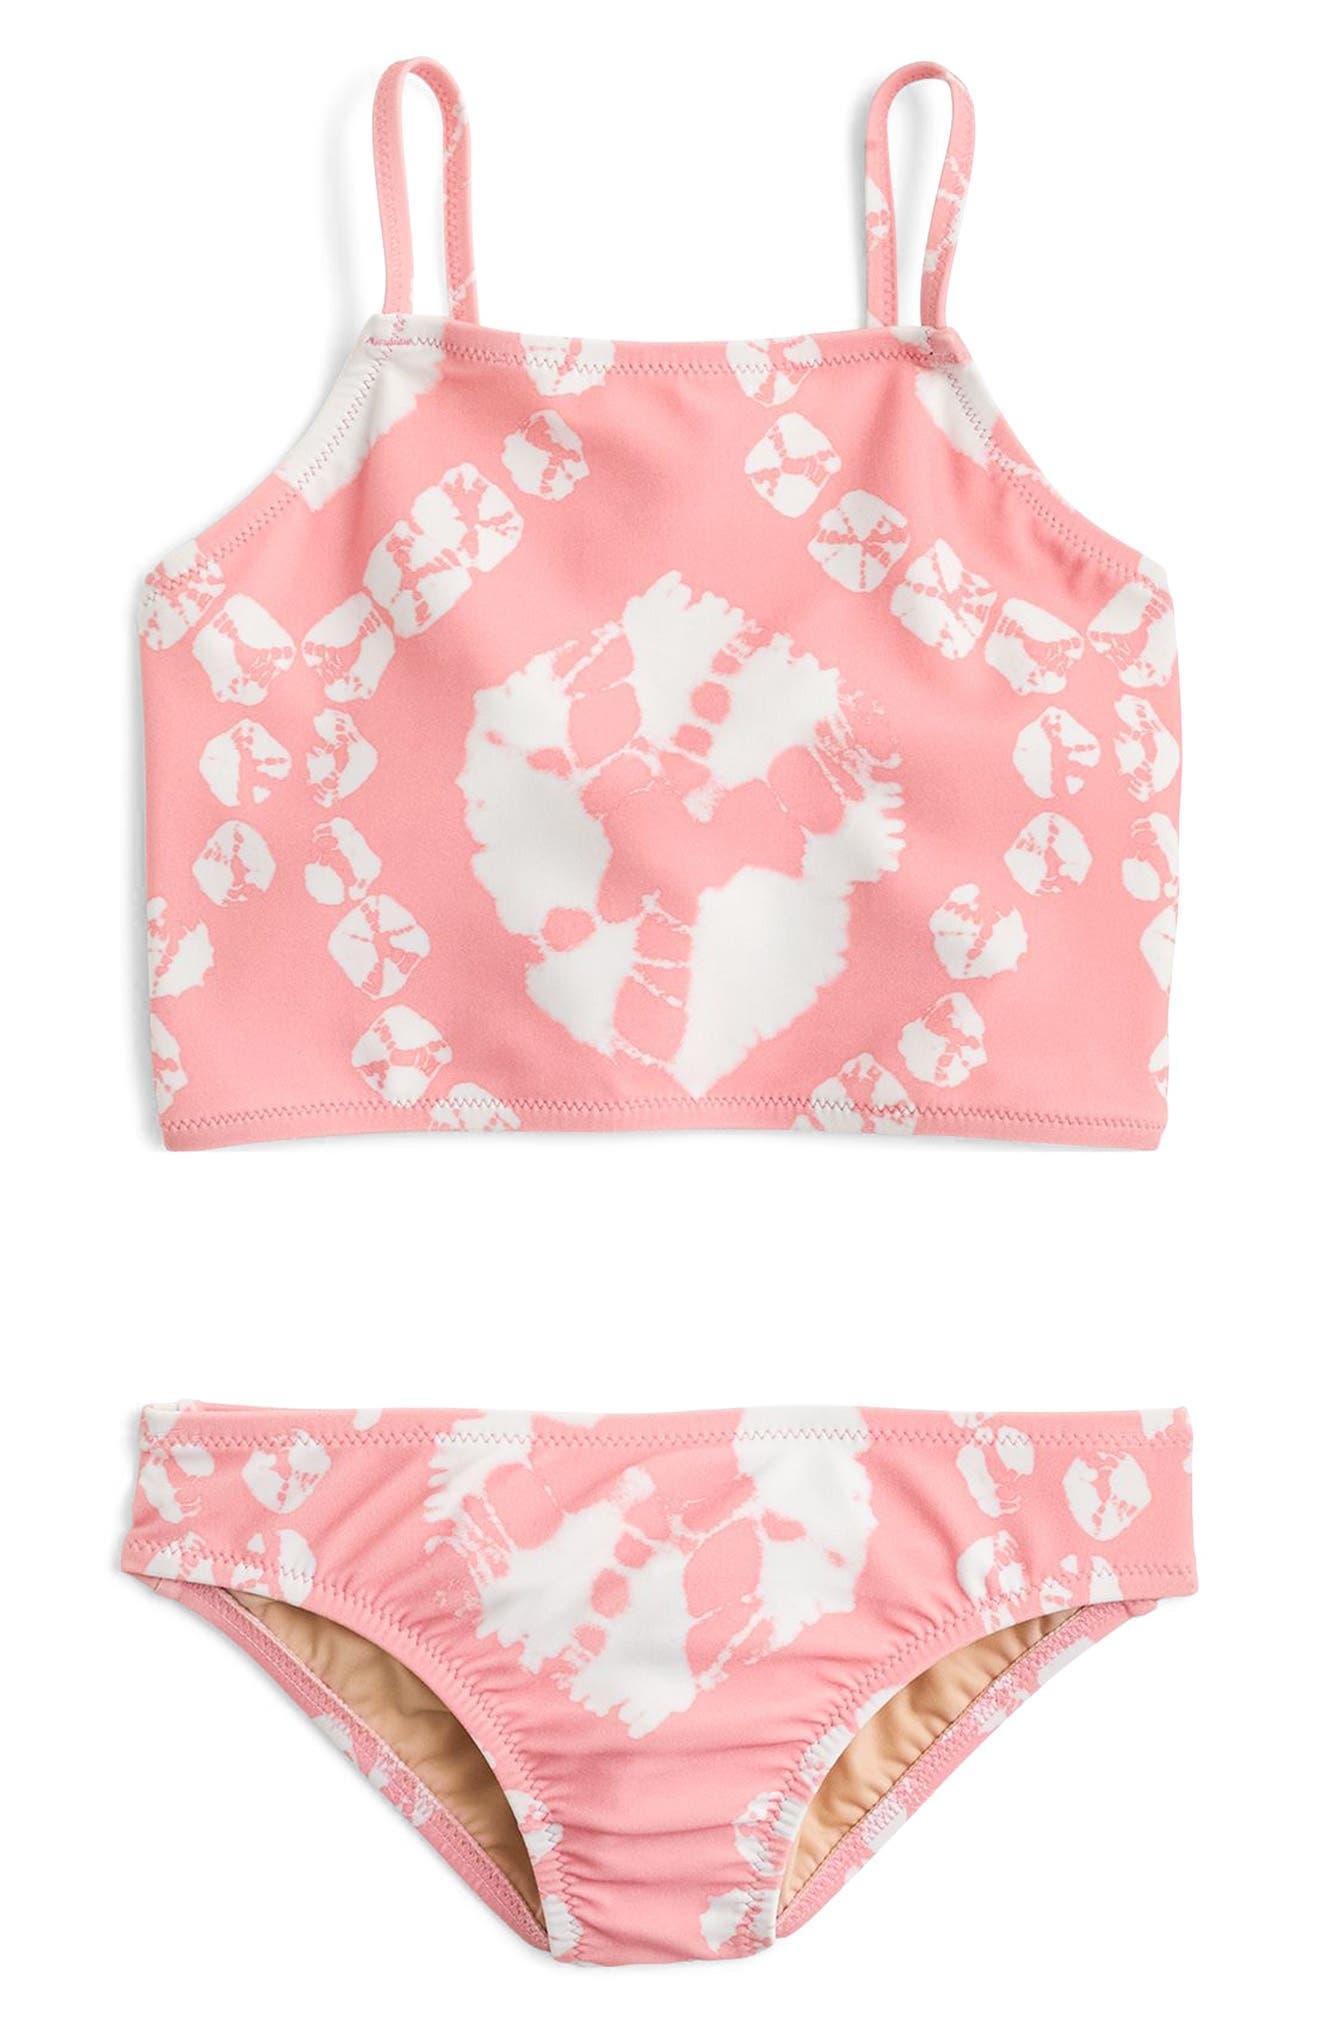 Main Image - crewcuts by J.Crew Tie Dye Two-Piece Swimsuit (Toddler Girls, Little Girls & Big Girls)